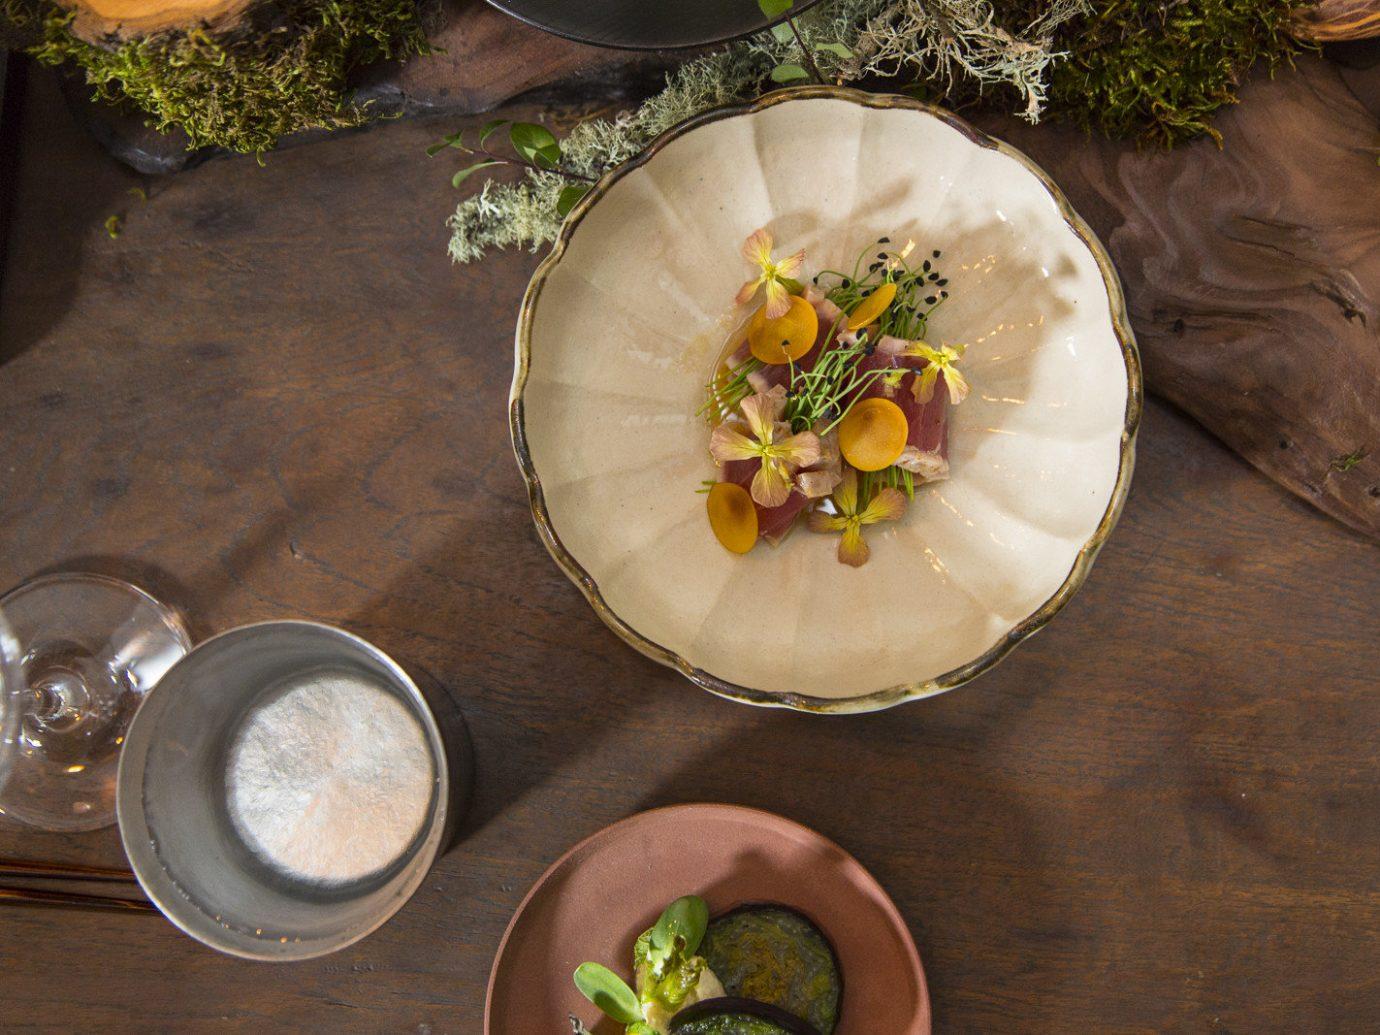 Food + Drink table food wooden dish meal produce leaf flower restaurant meat vegetable